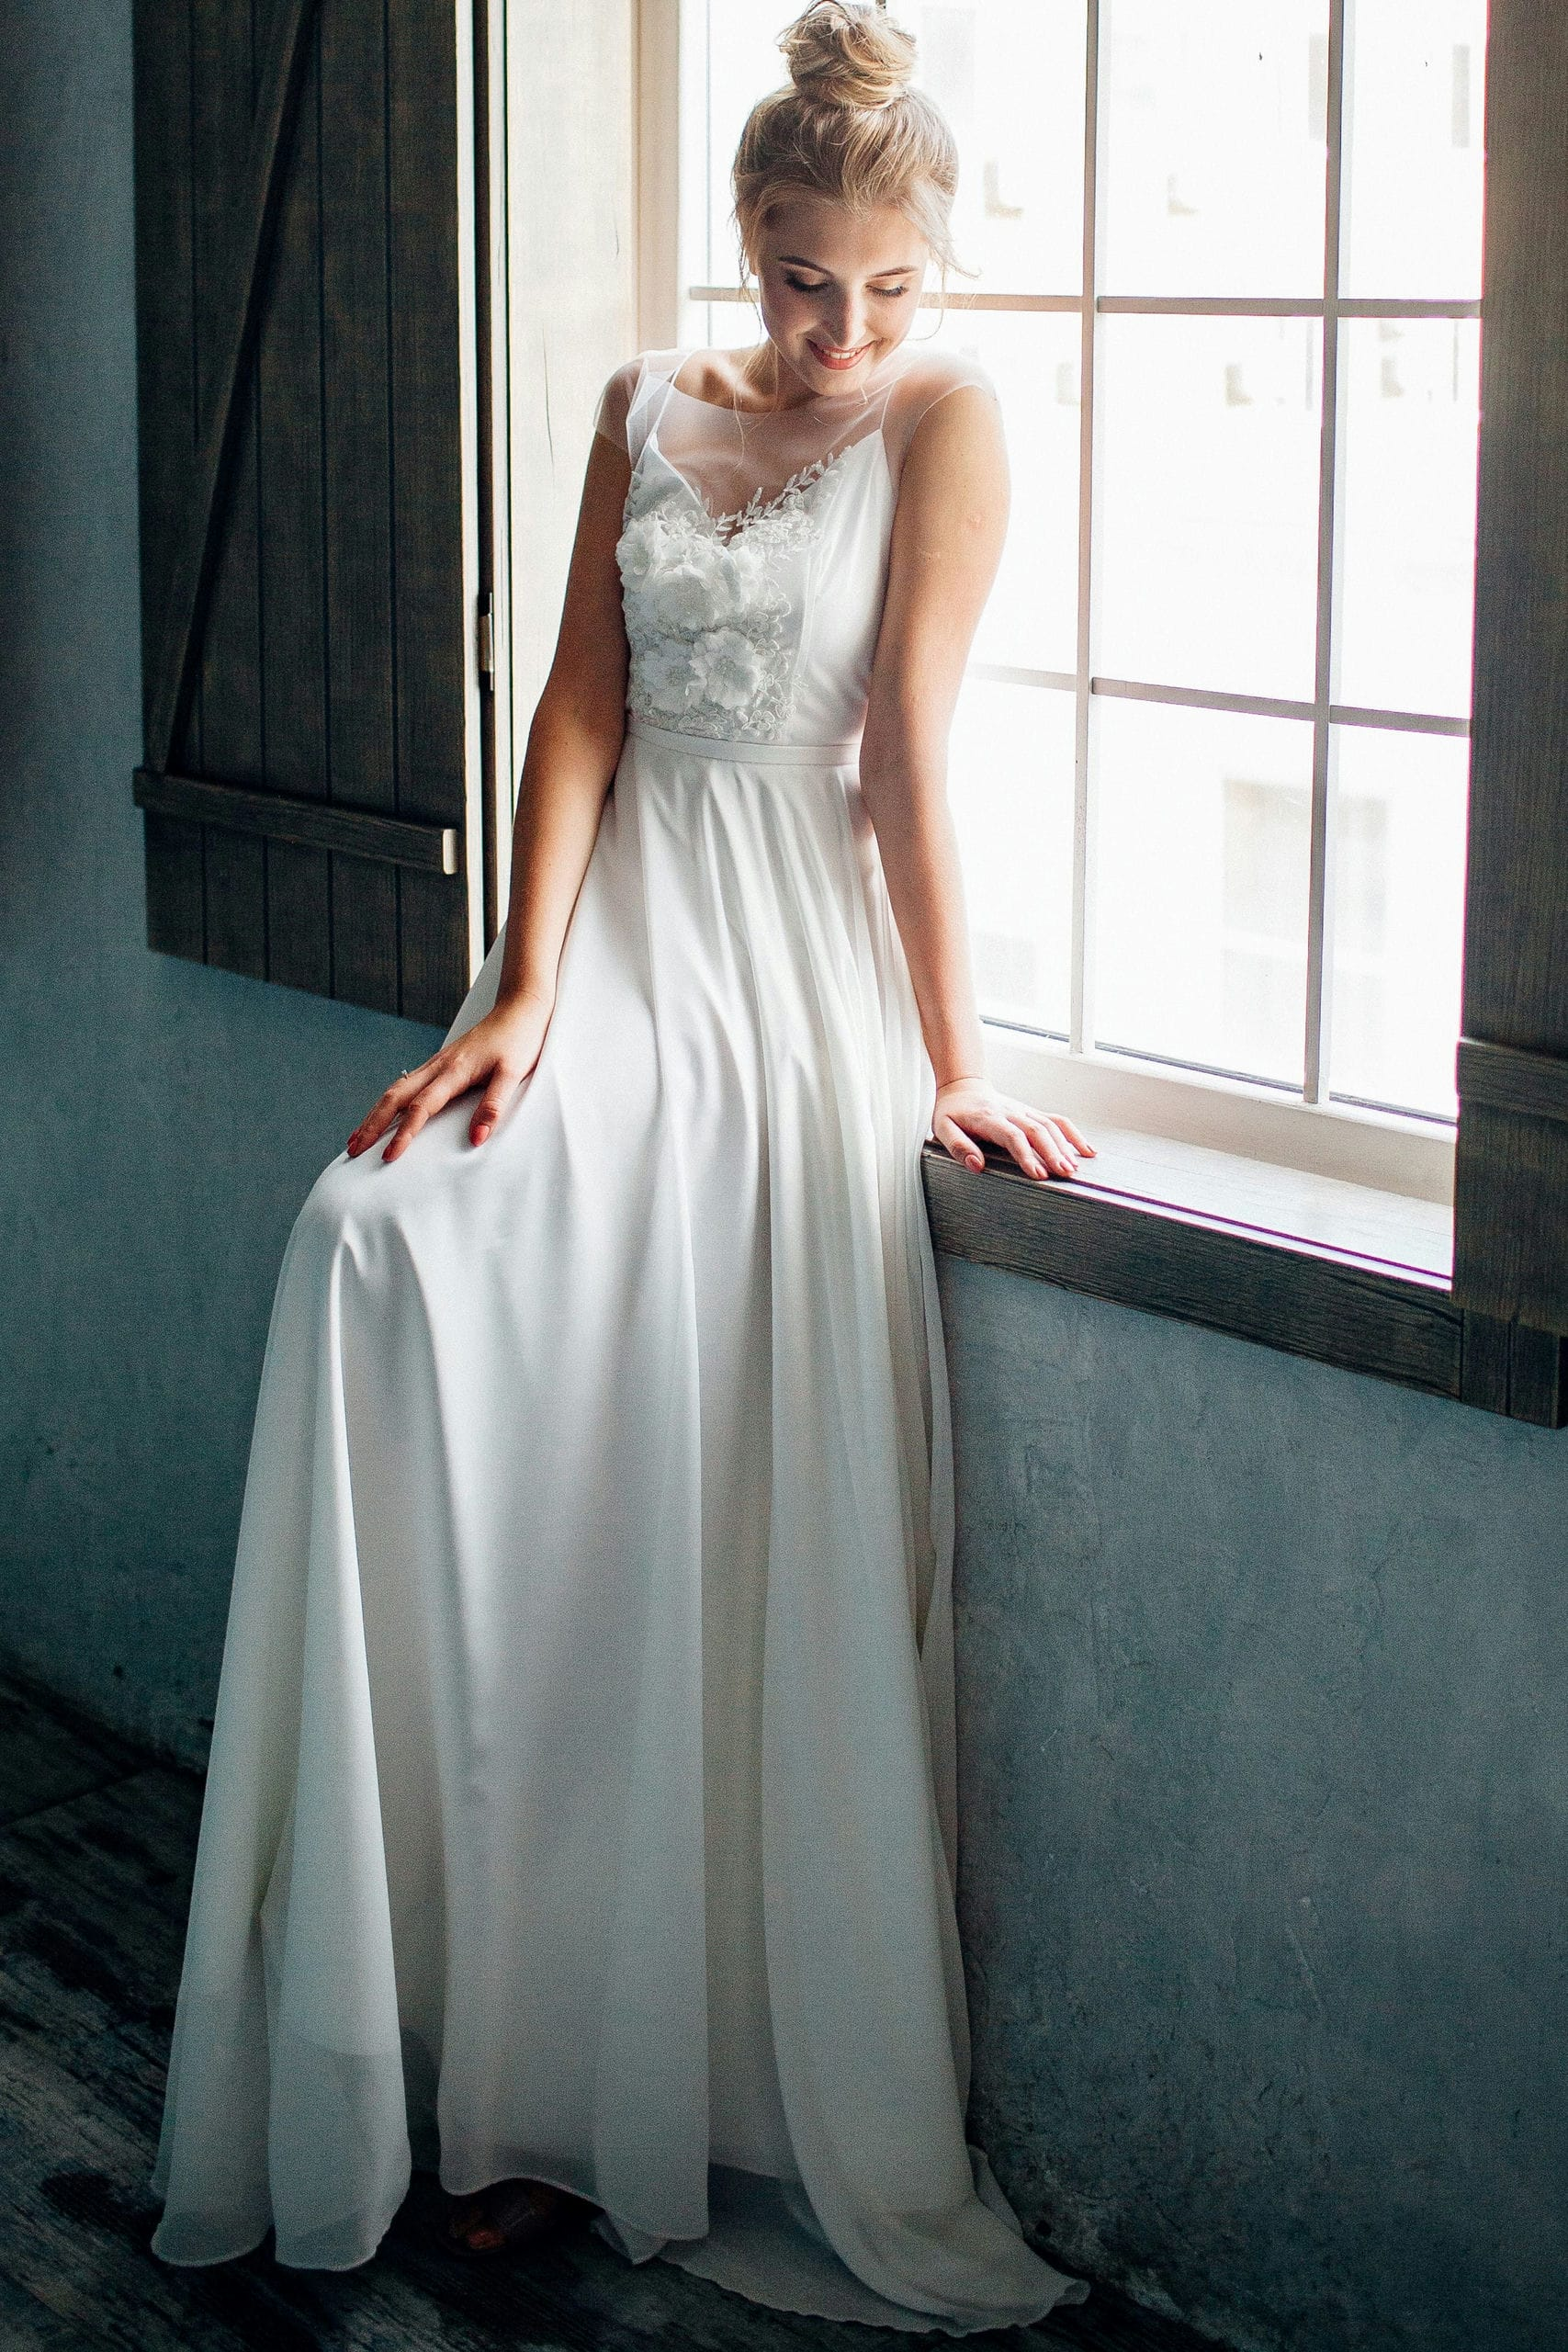 Свадебное платье ZARALLA, коллекция THE ANGELS, бренд RARE BRIDAL, фото 1